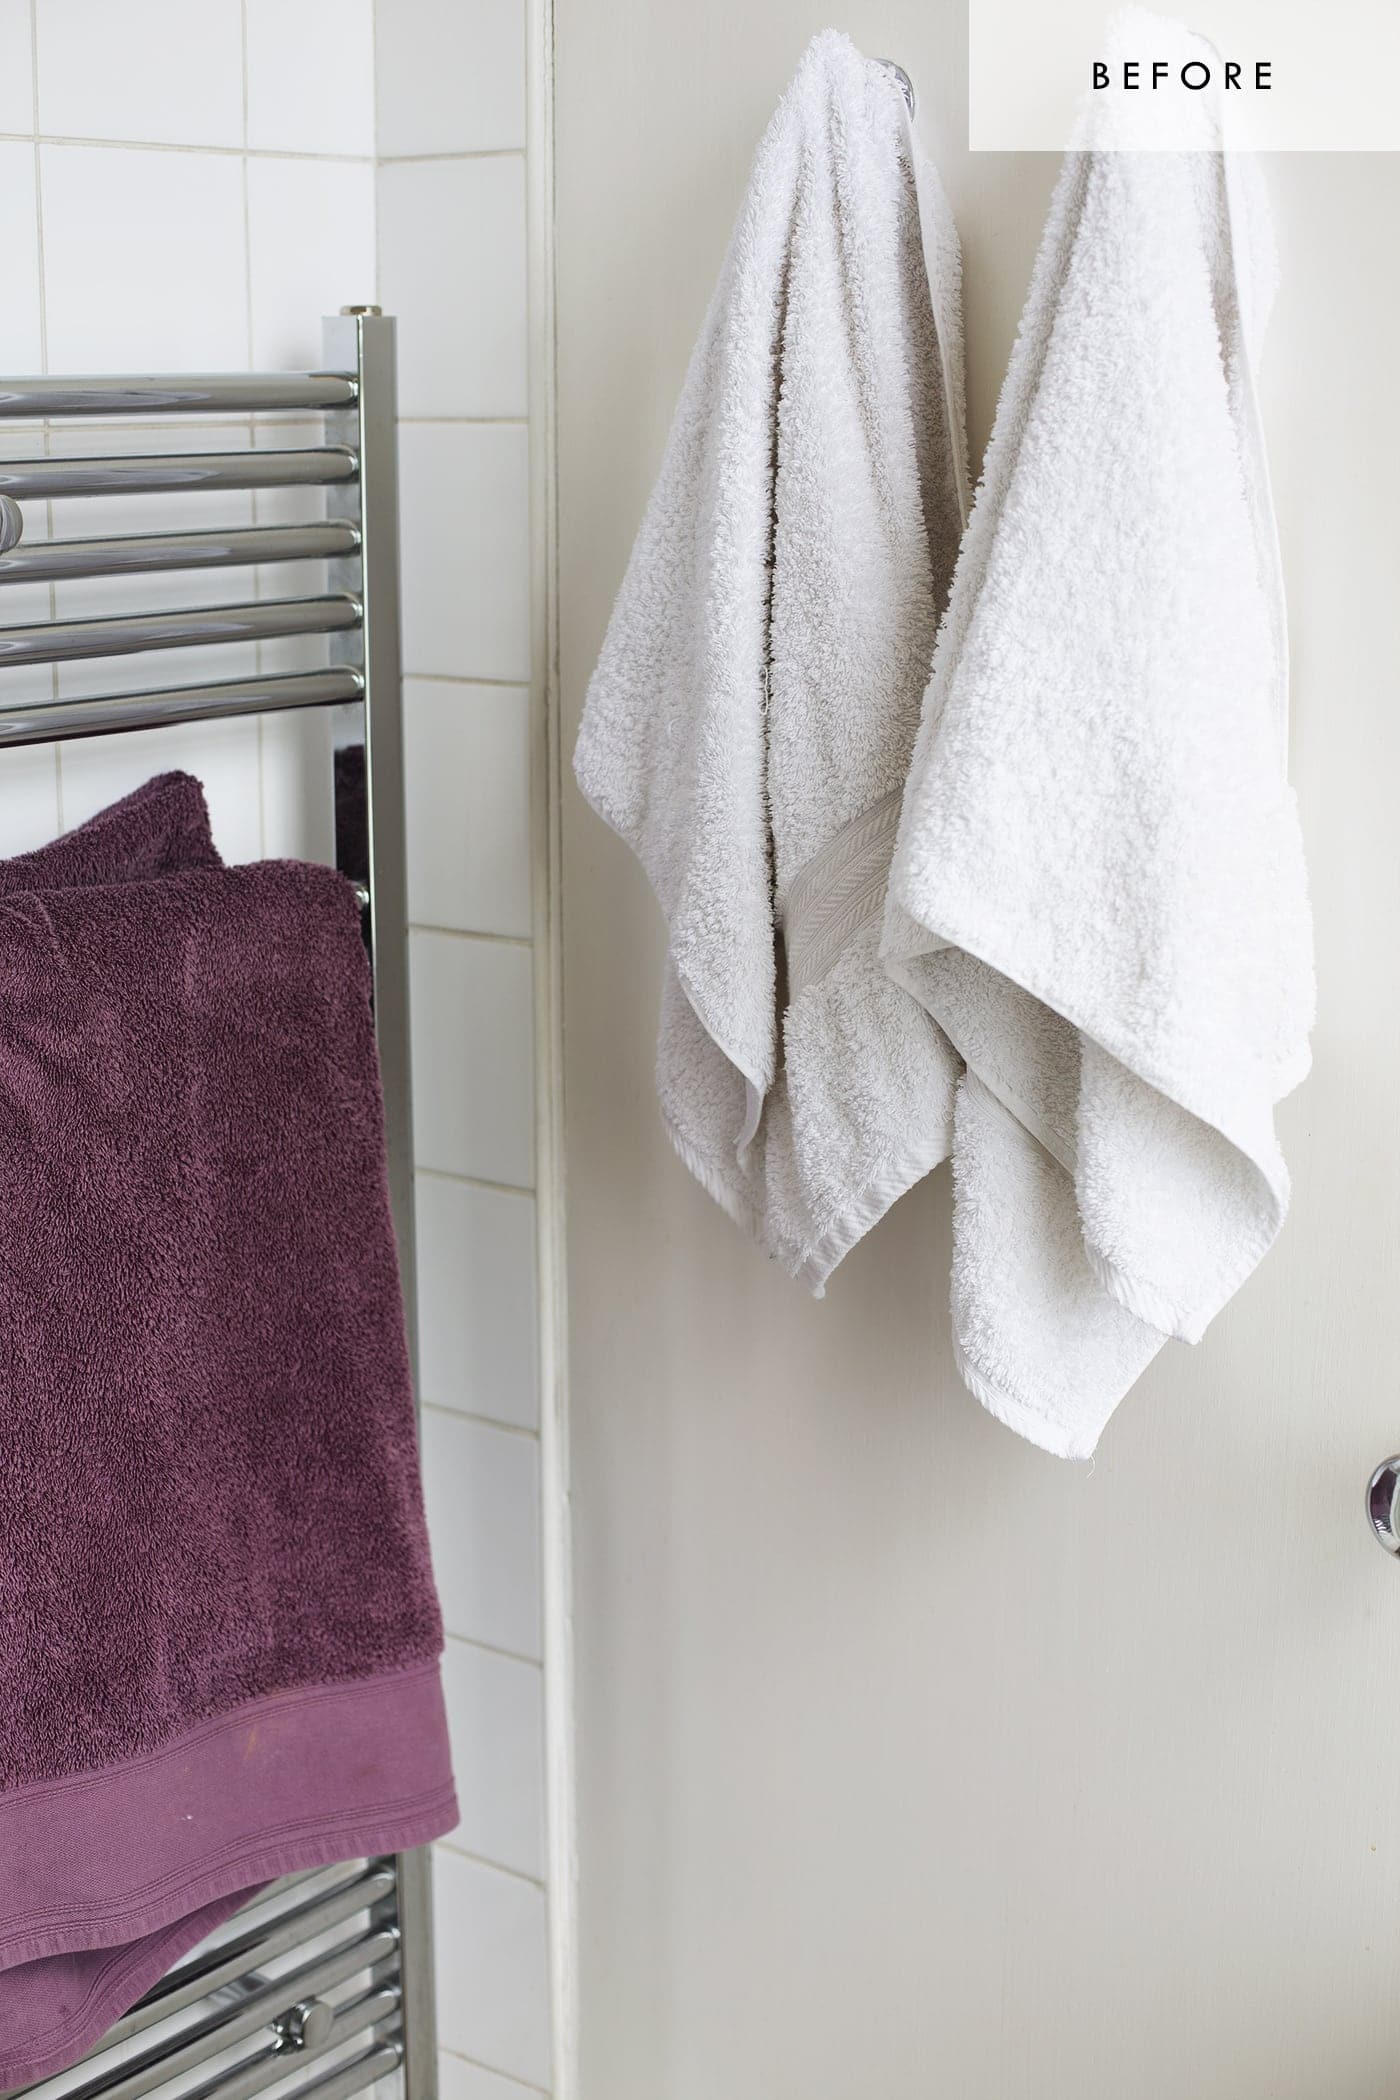 Bathroom refresh with Habitat | before 2